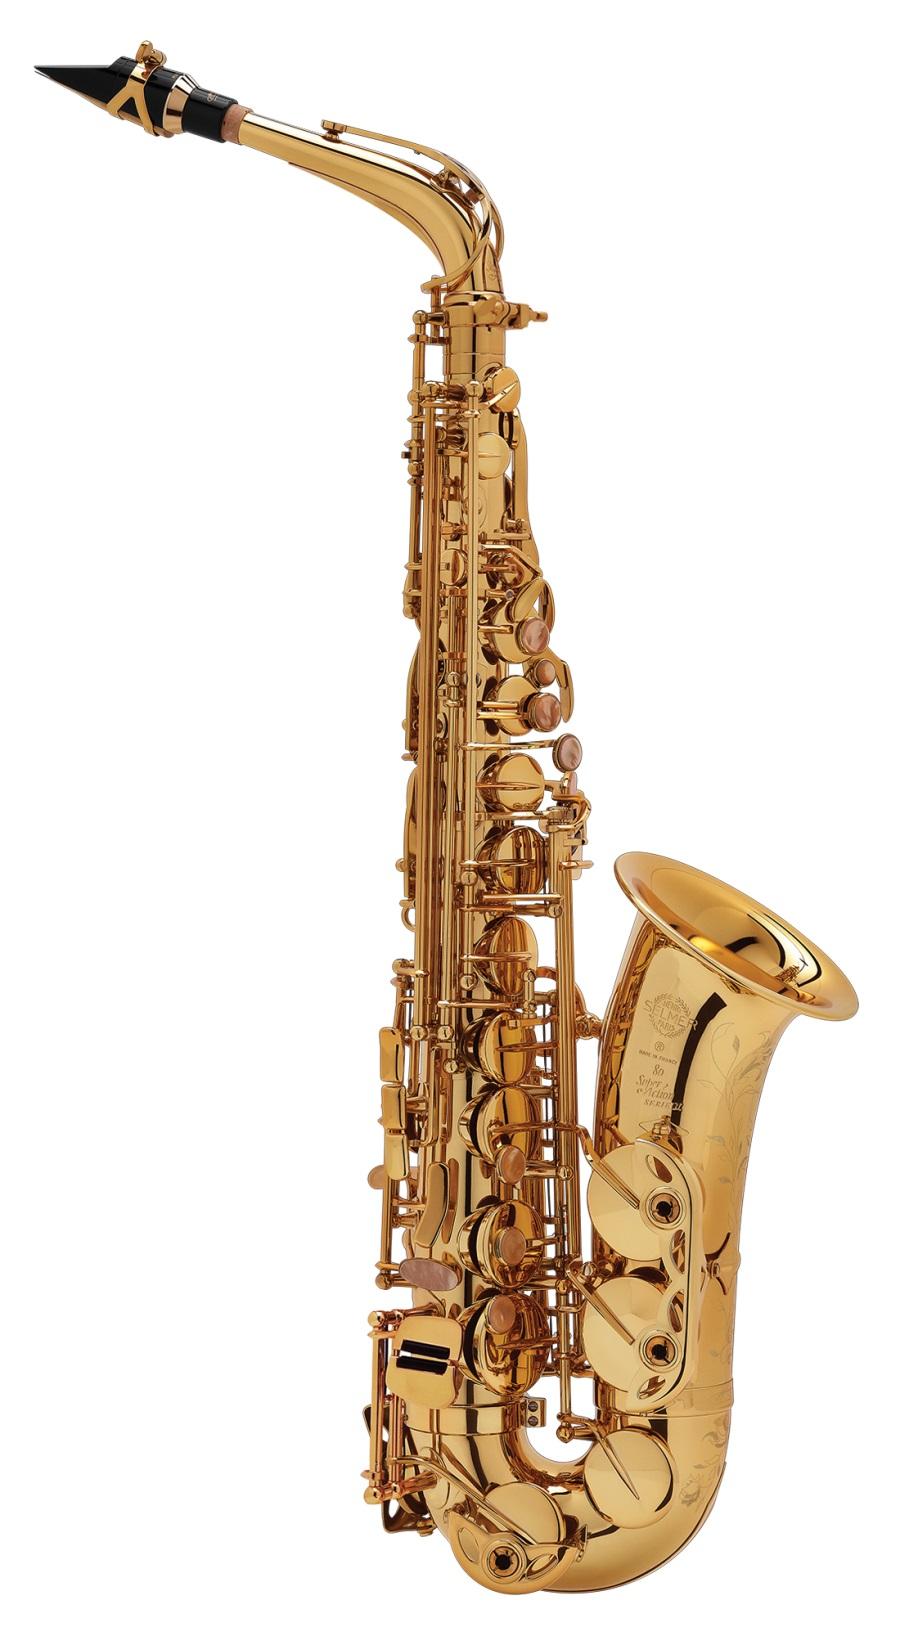 Selmer - SE-A-2-L-SET - / SA-80-II - Holzblasinstrumente - Saxophone | MUSIK BERTRAM Deutschland Freiburg